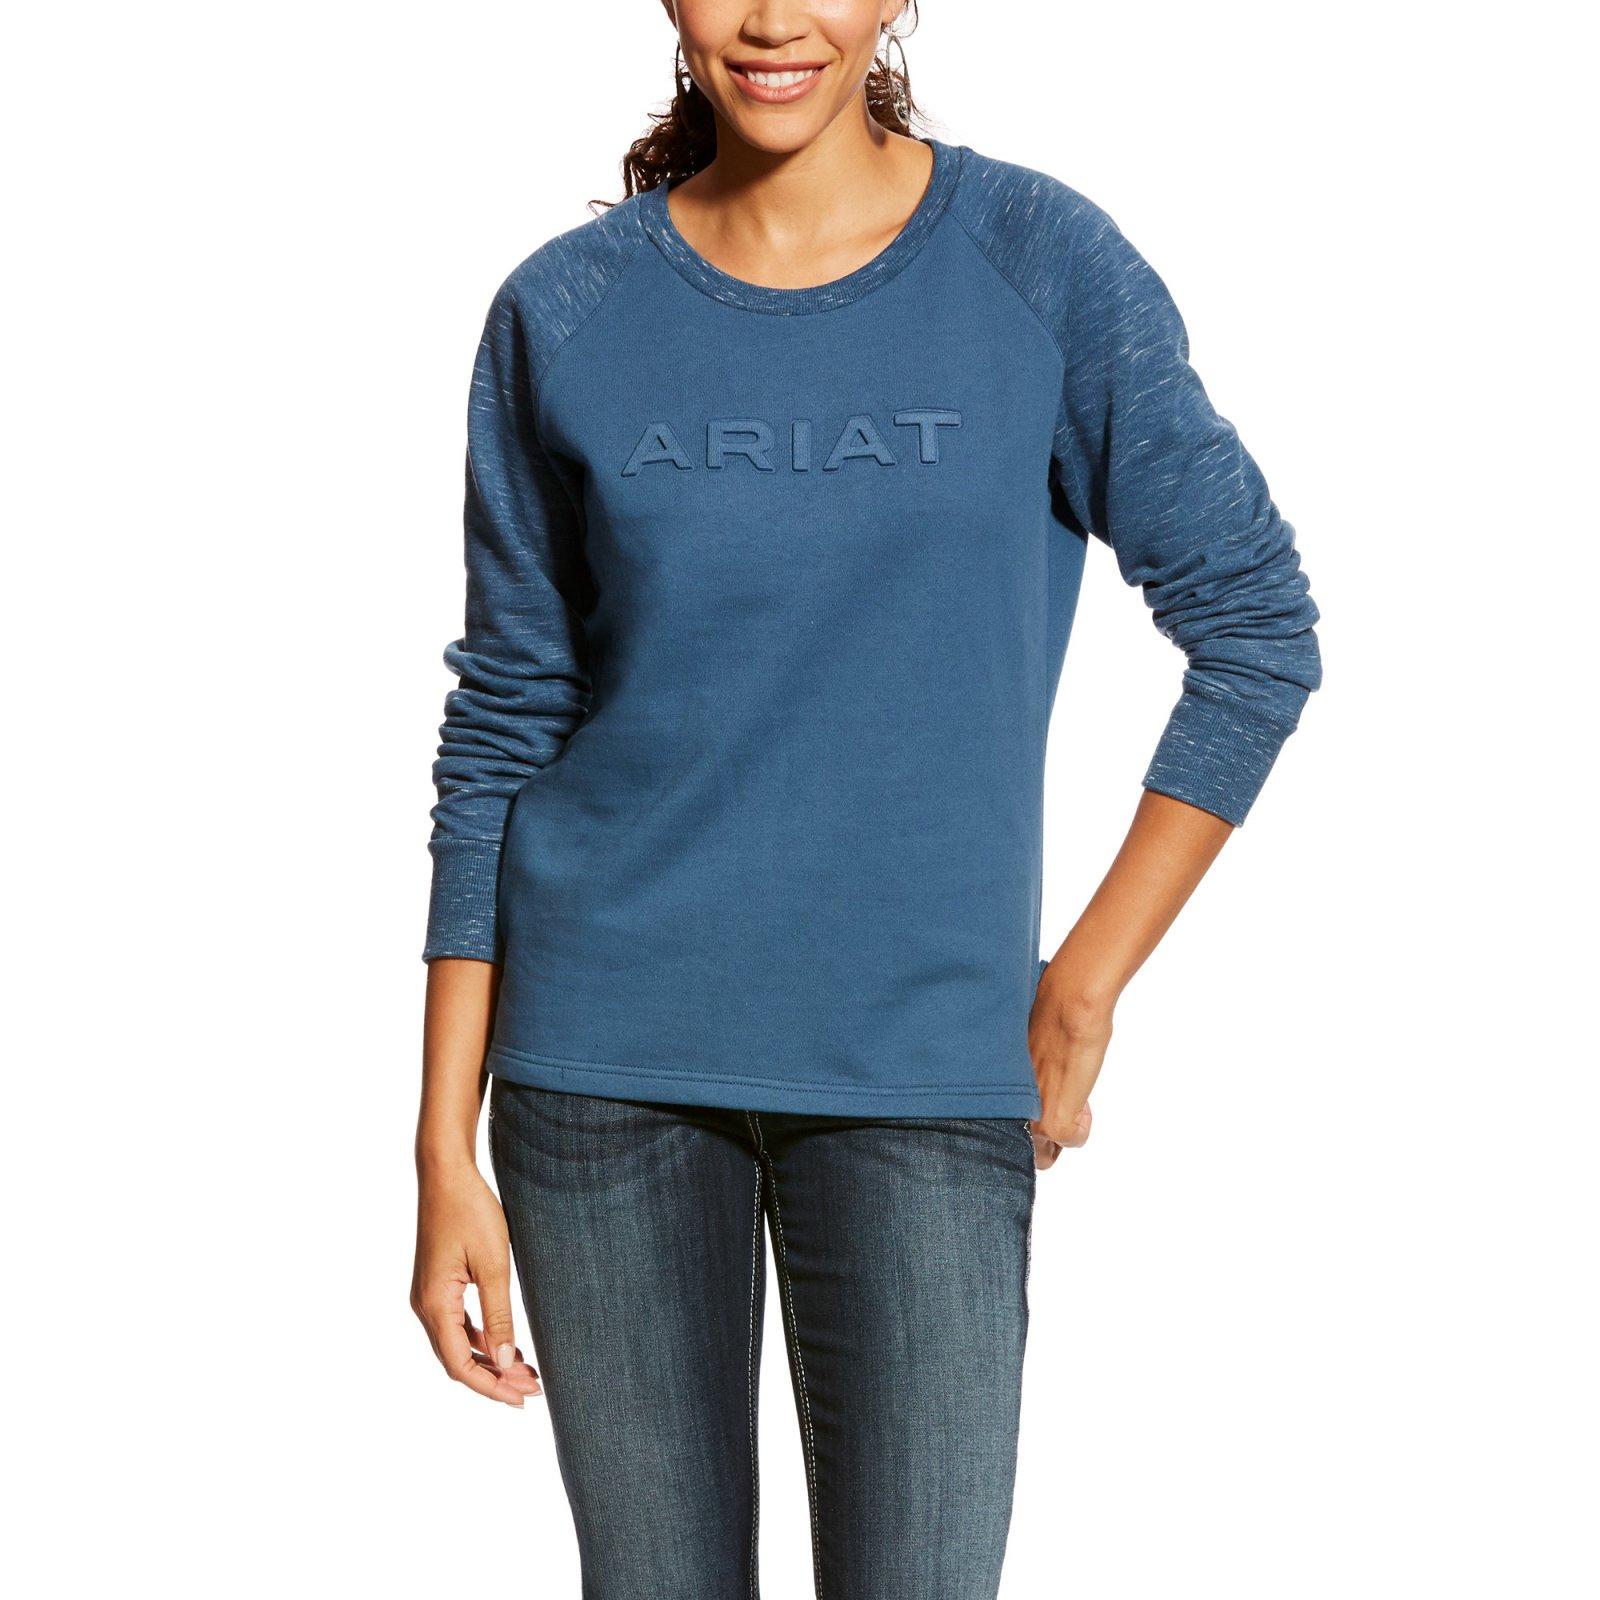 Real Logo Crew Sweatshirt from Ariat